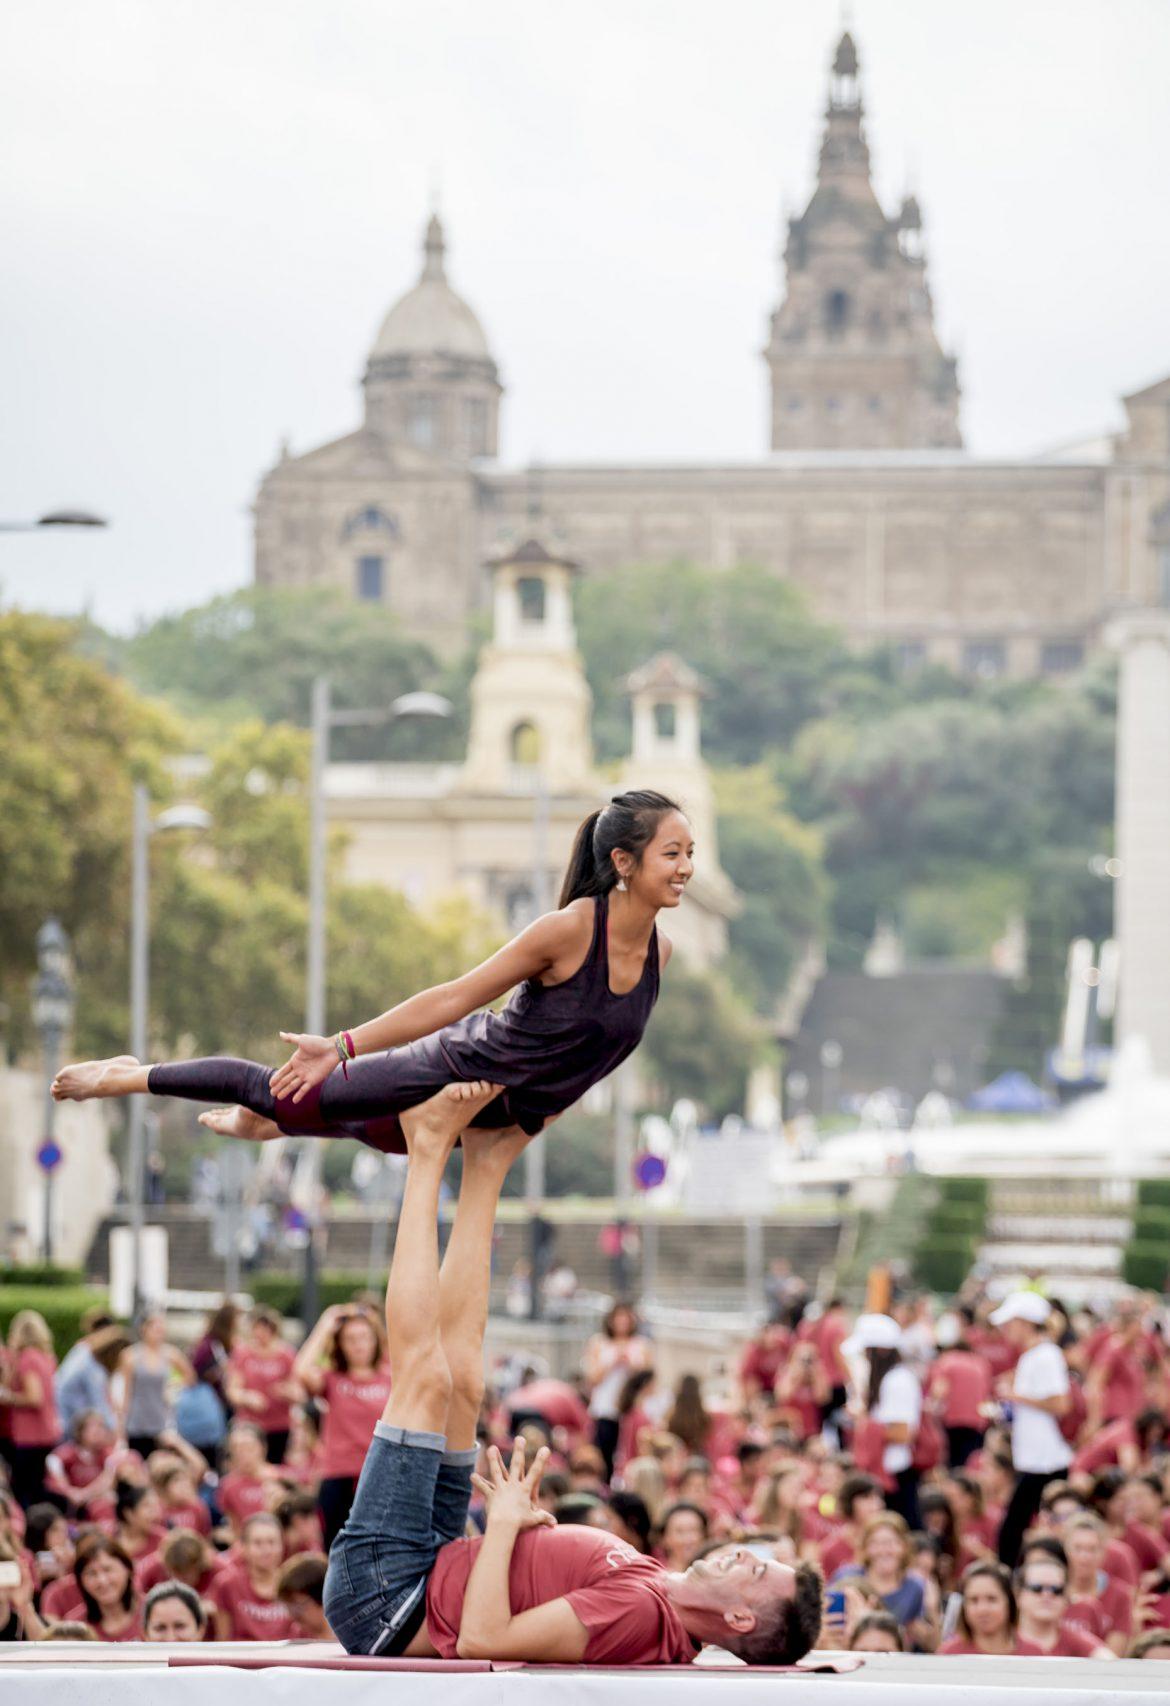 chica practicando yoga aéreo